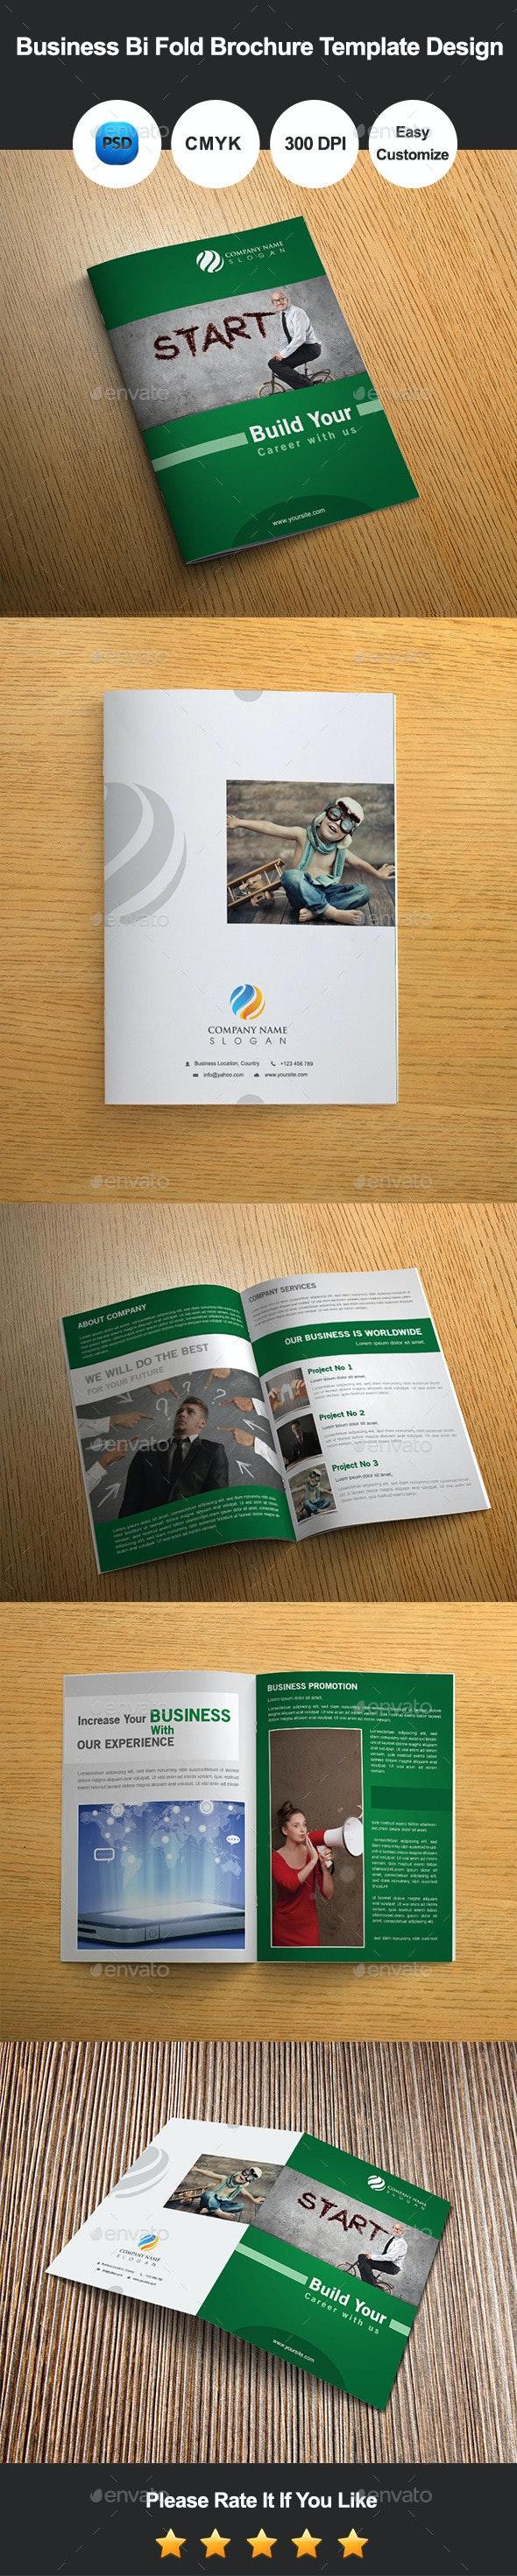 6 Pages Business Bi Fold Brochure Template Design - Informational Brochures